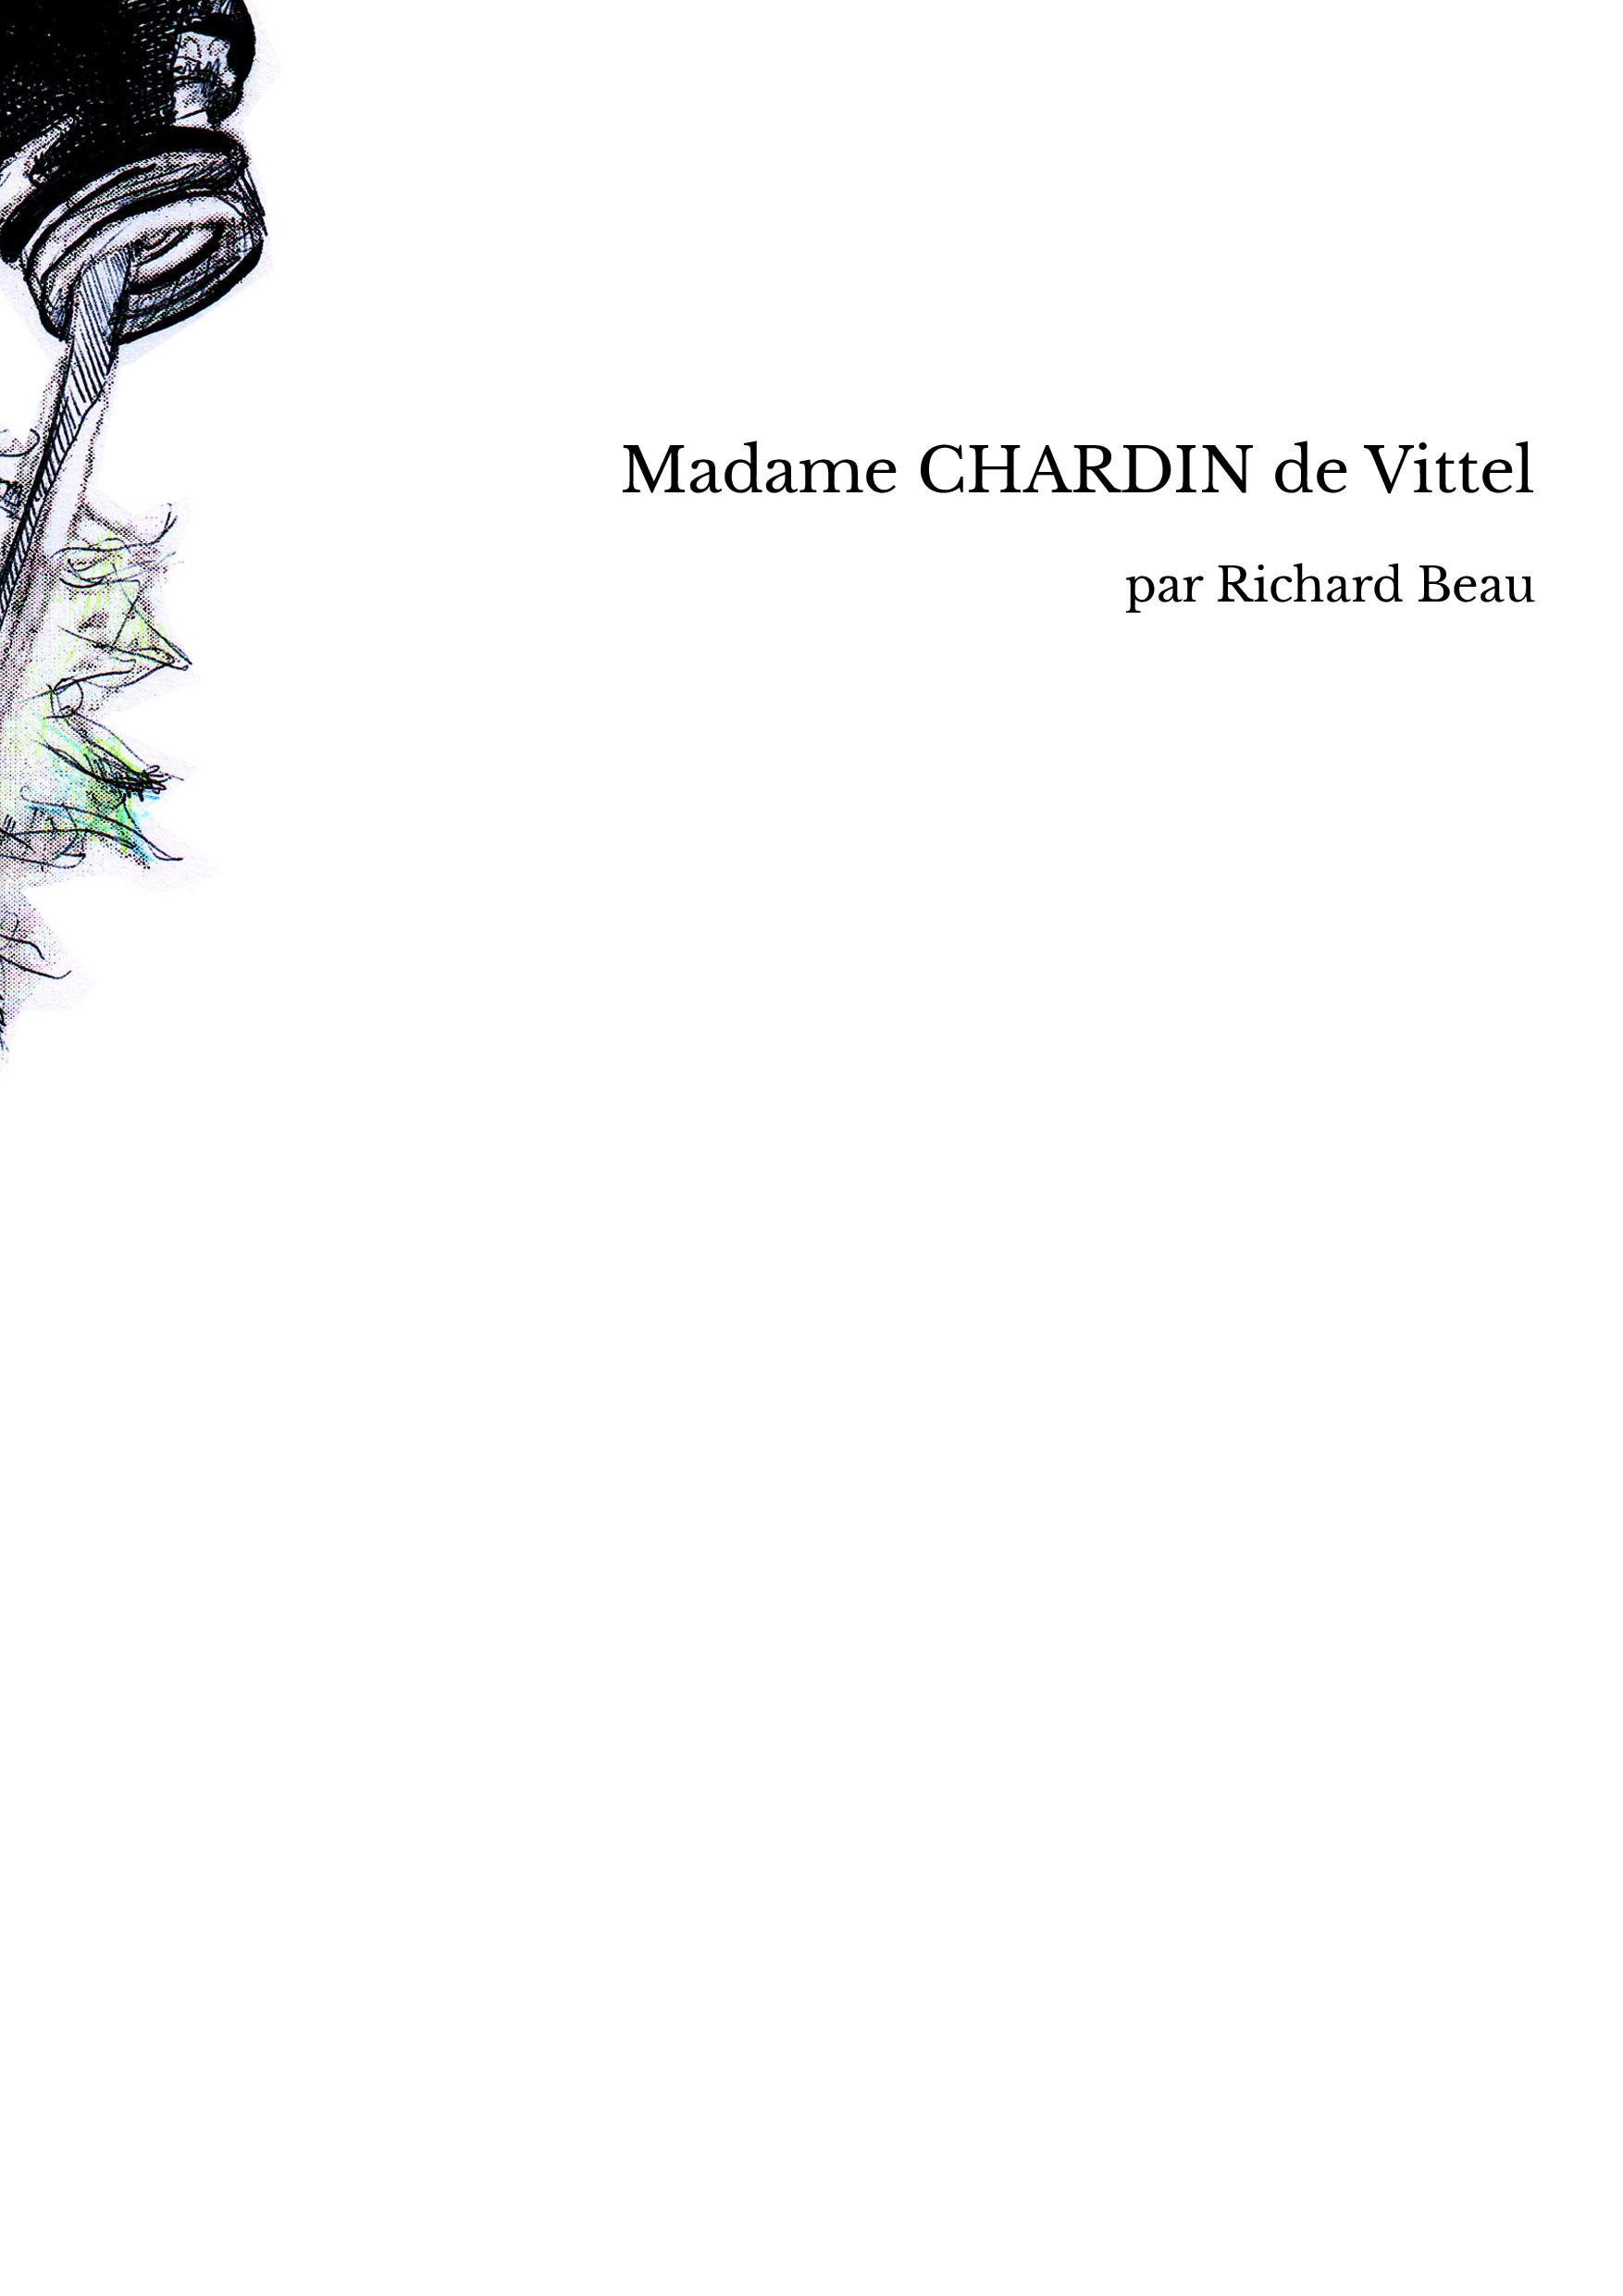 Madame CHARDIN de Vittel